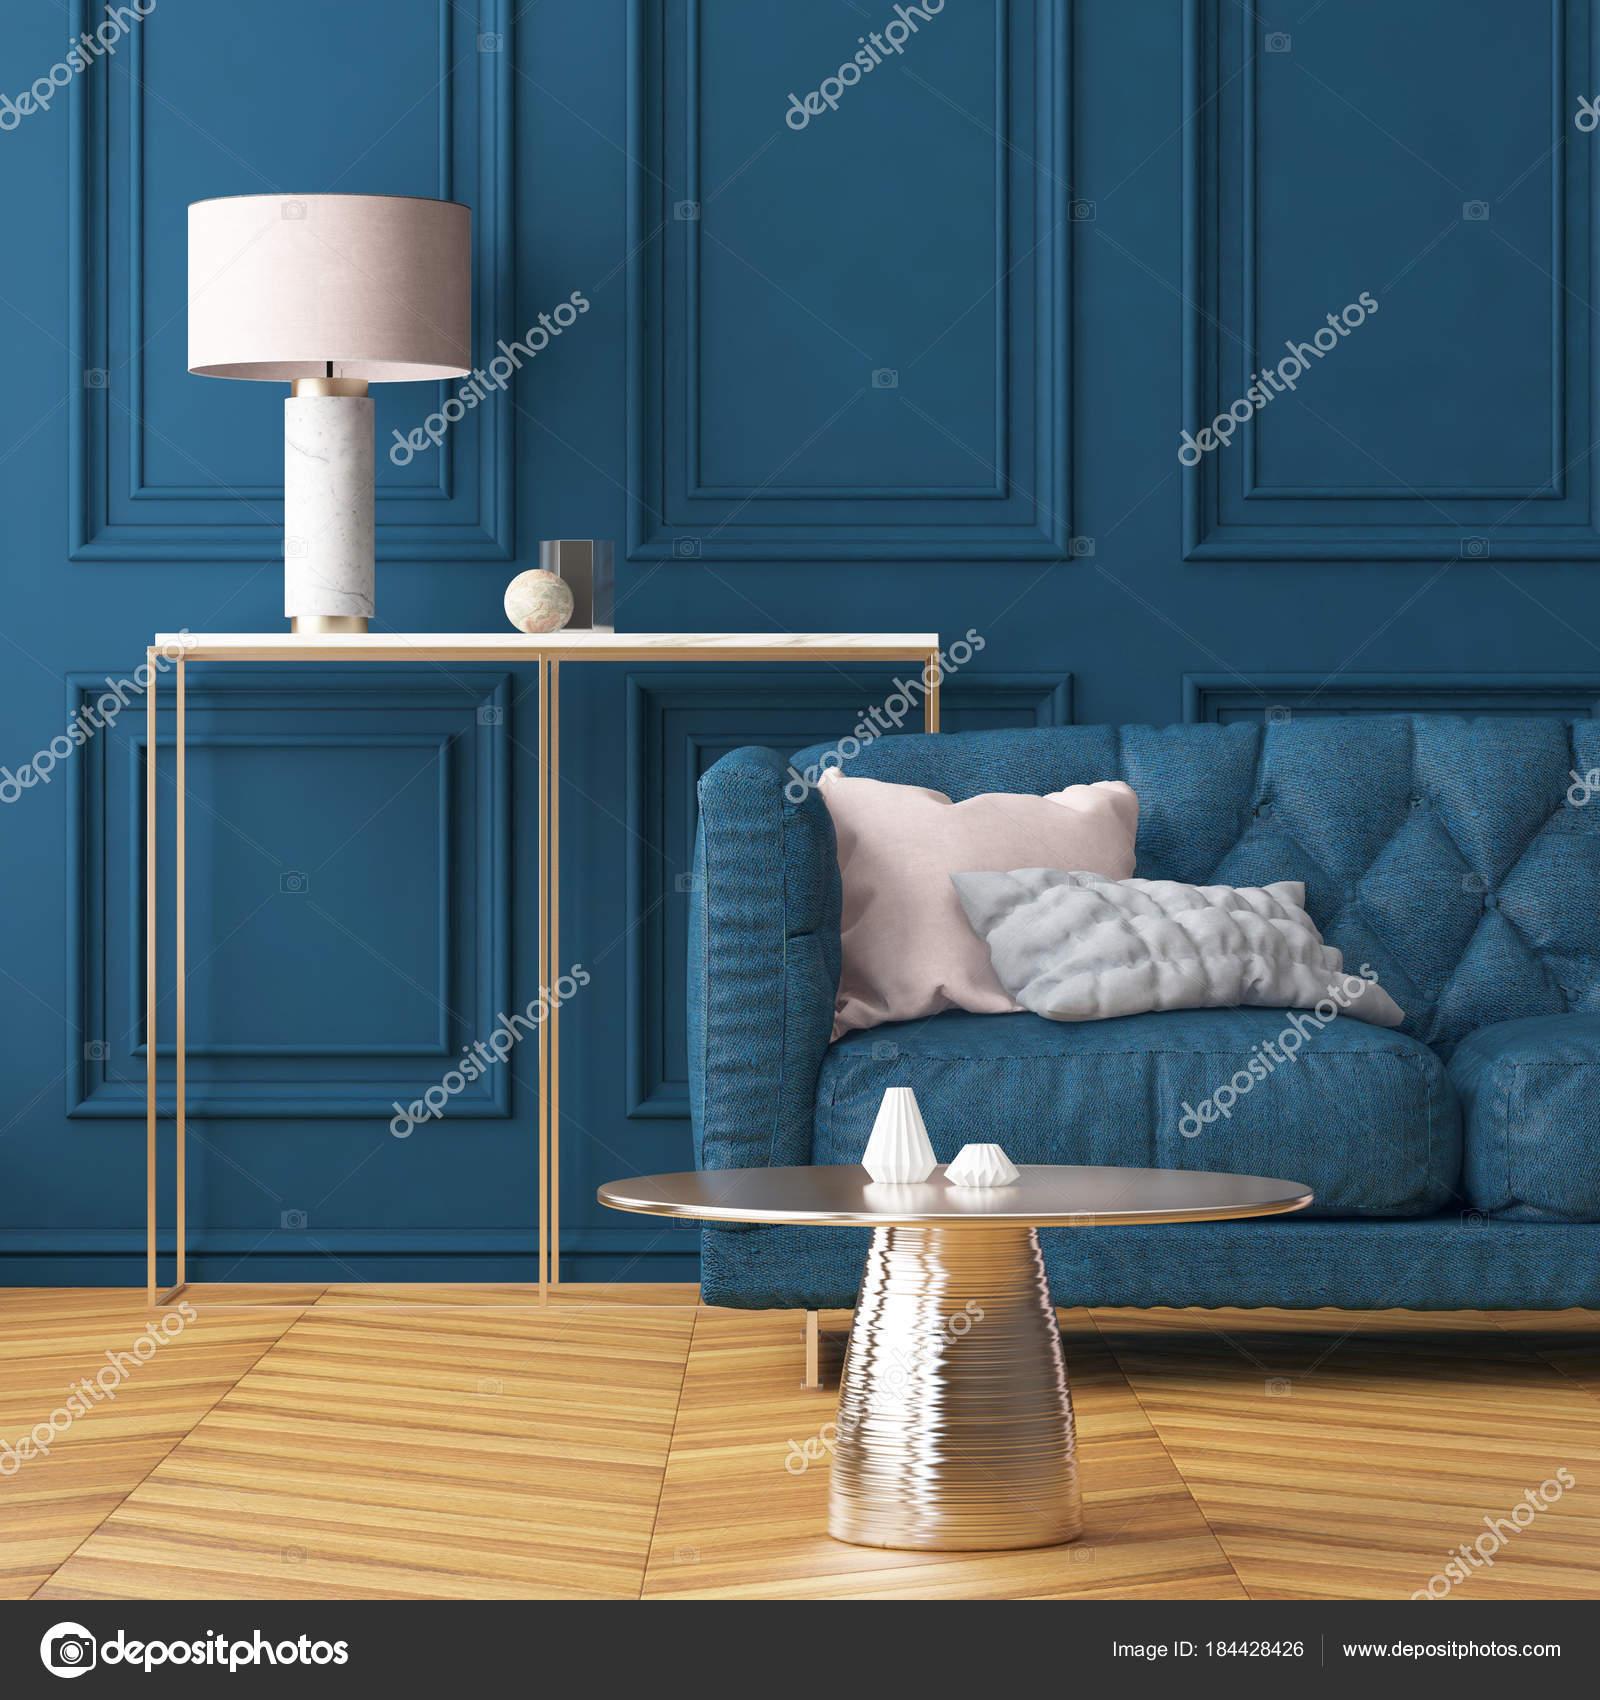 woonkamer interieur met donker blauwe muur slaapbank trend kleuren stockfoto